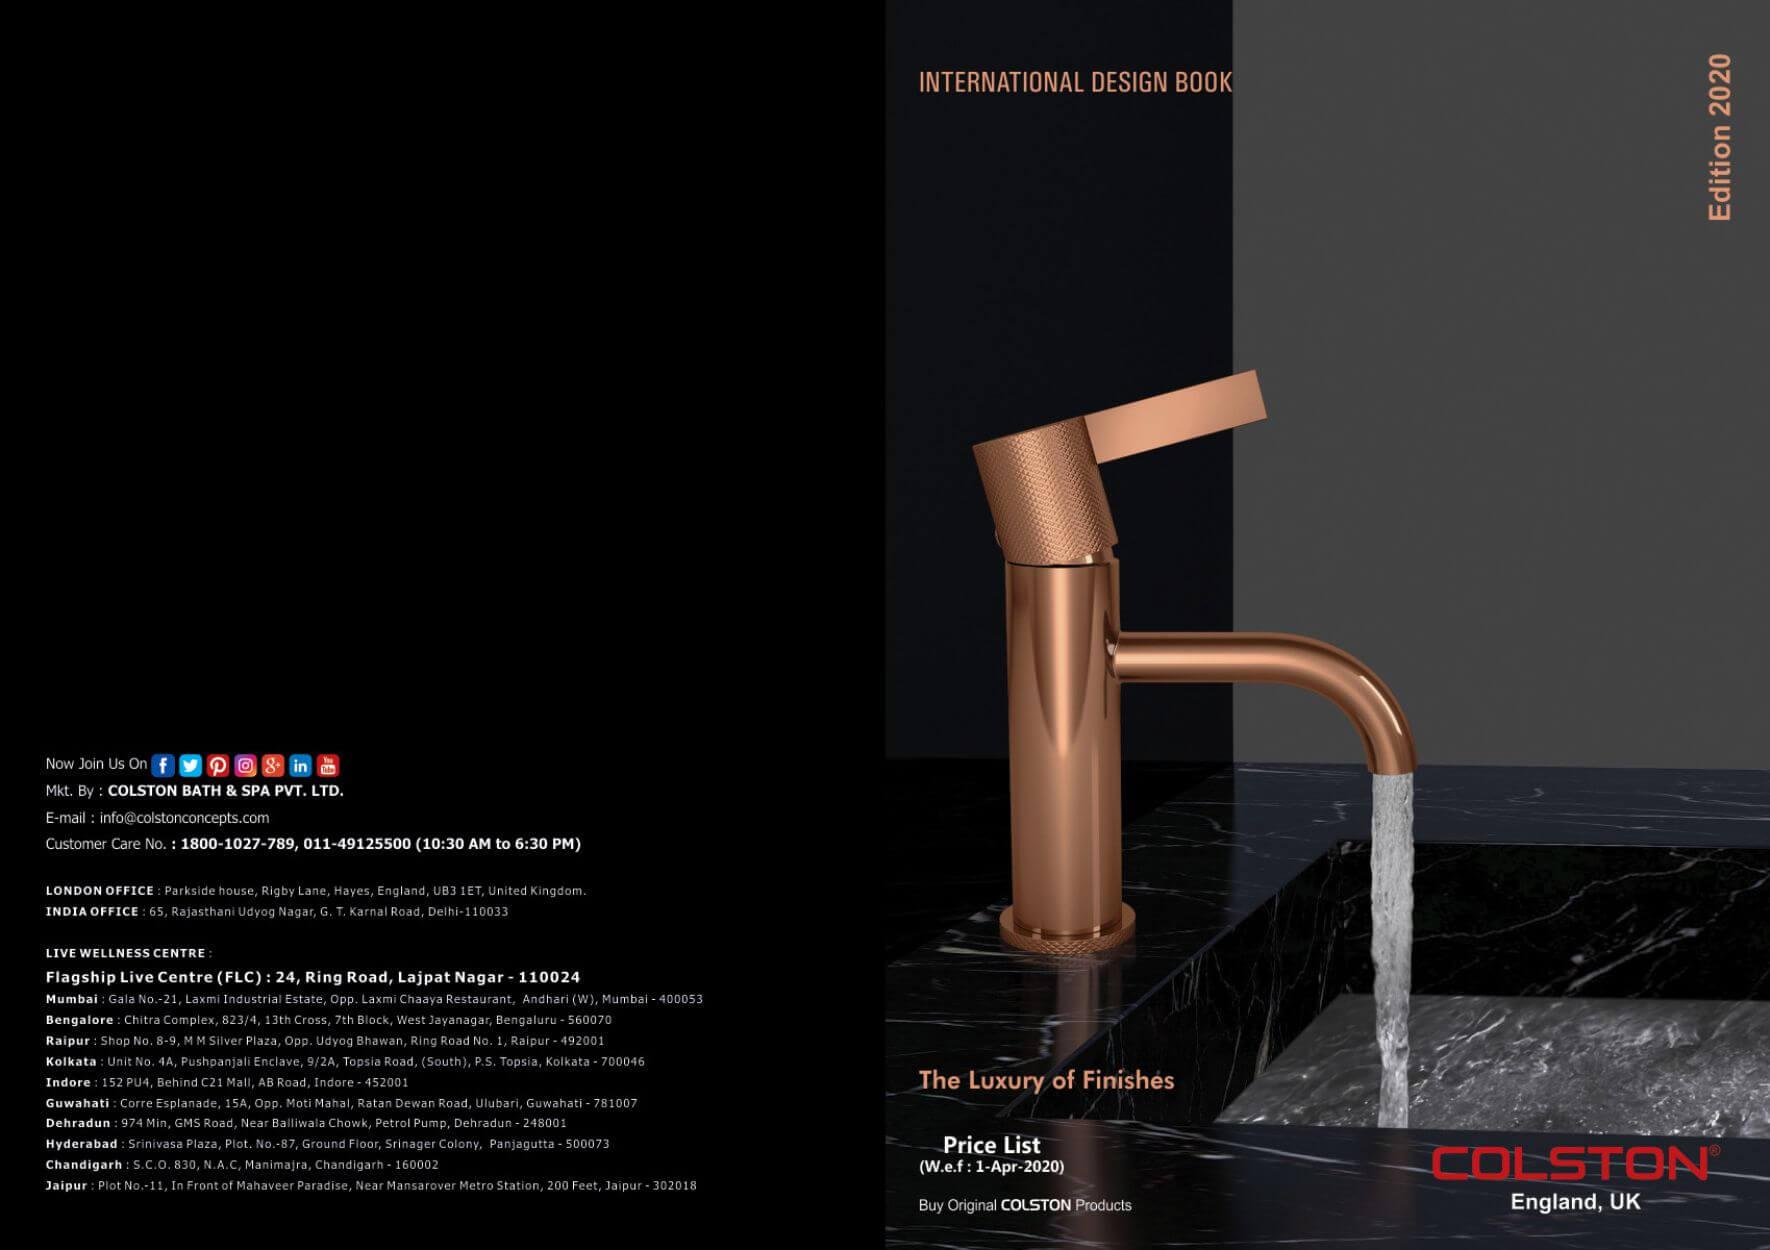 Page 1-Faucet